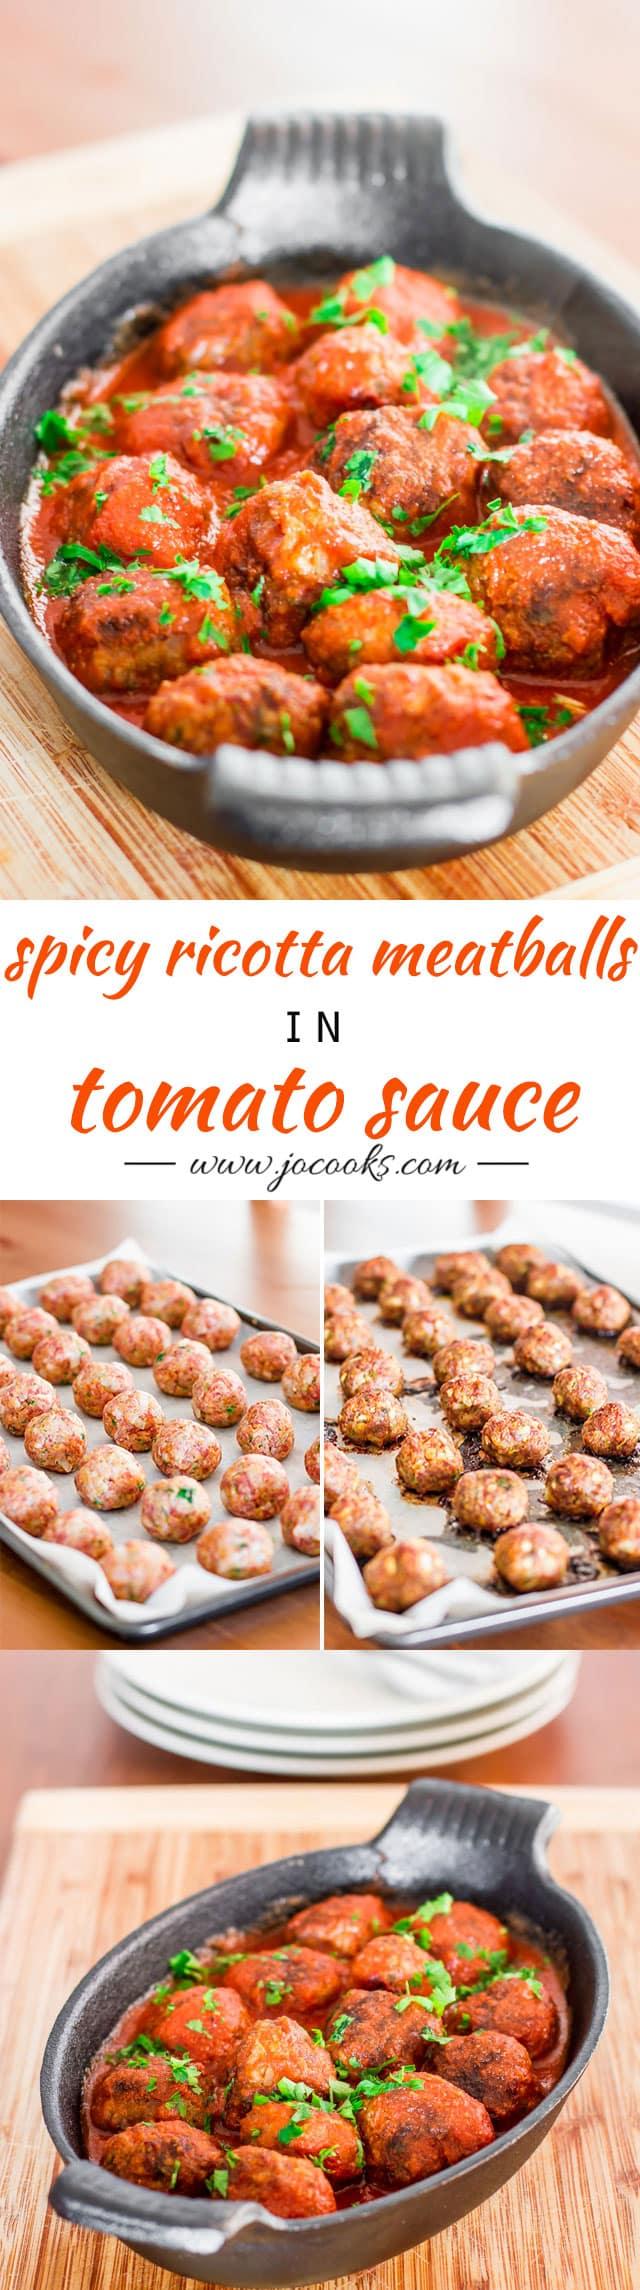 spicy-ricotta-meatballs-in-tomato-sauce-collage1